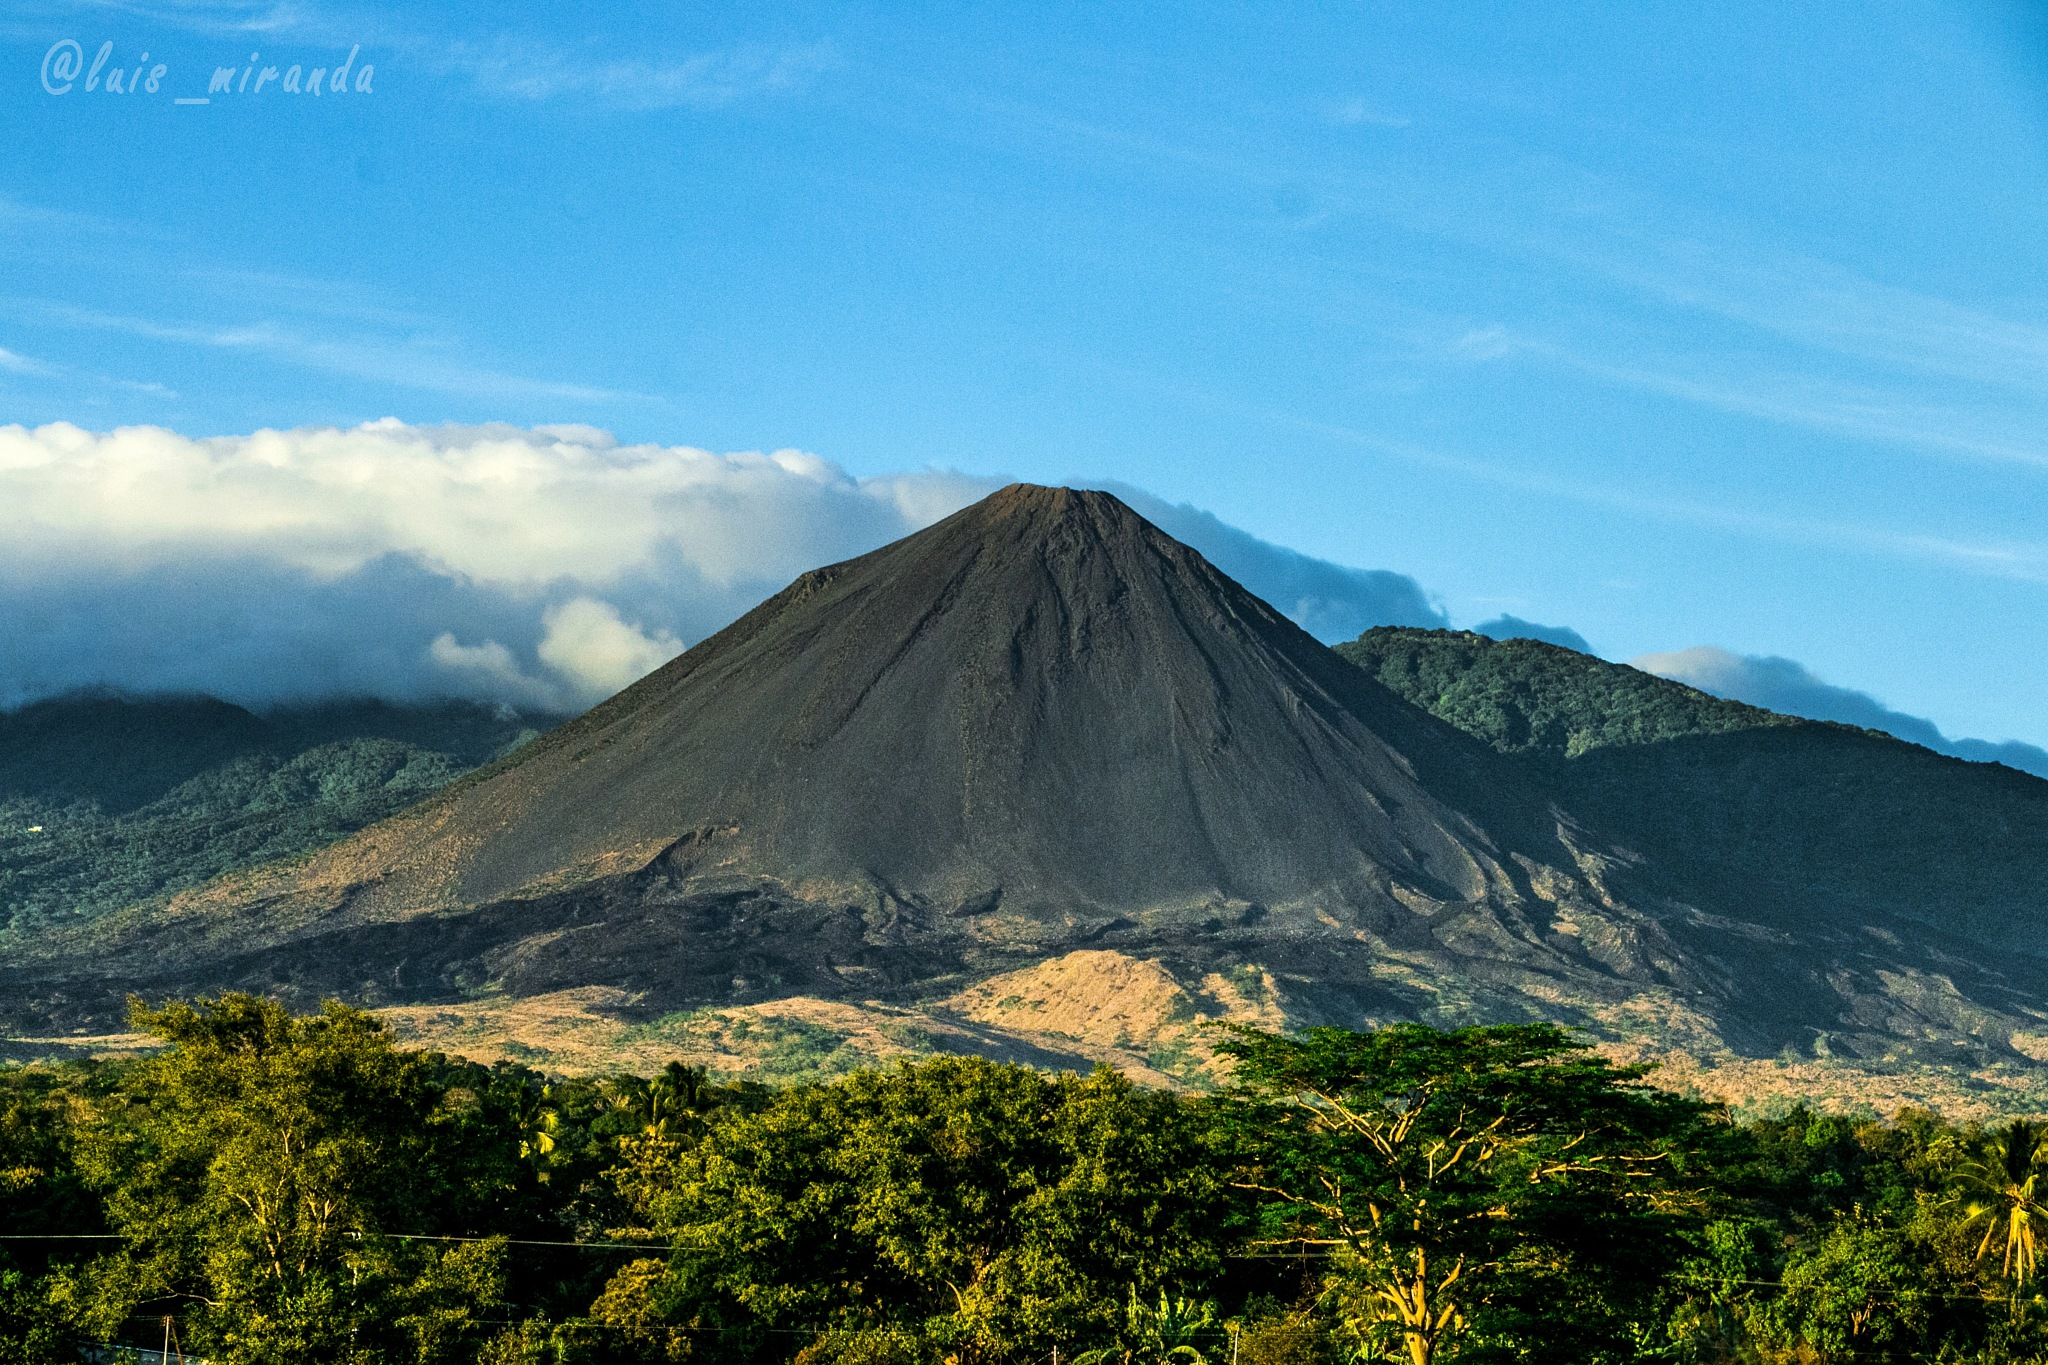 Volcán de Izalco  by Luis Miranda